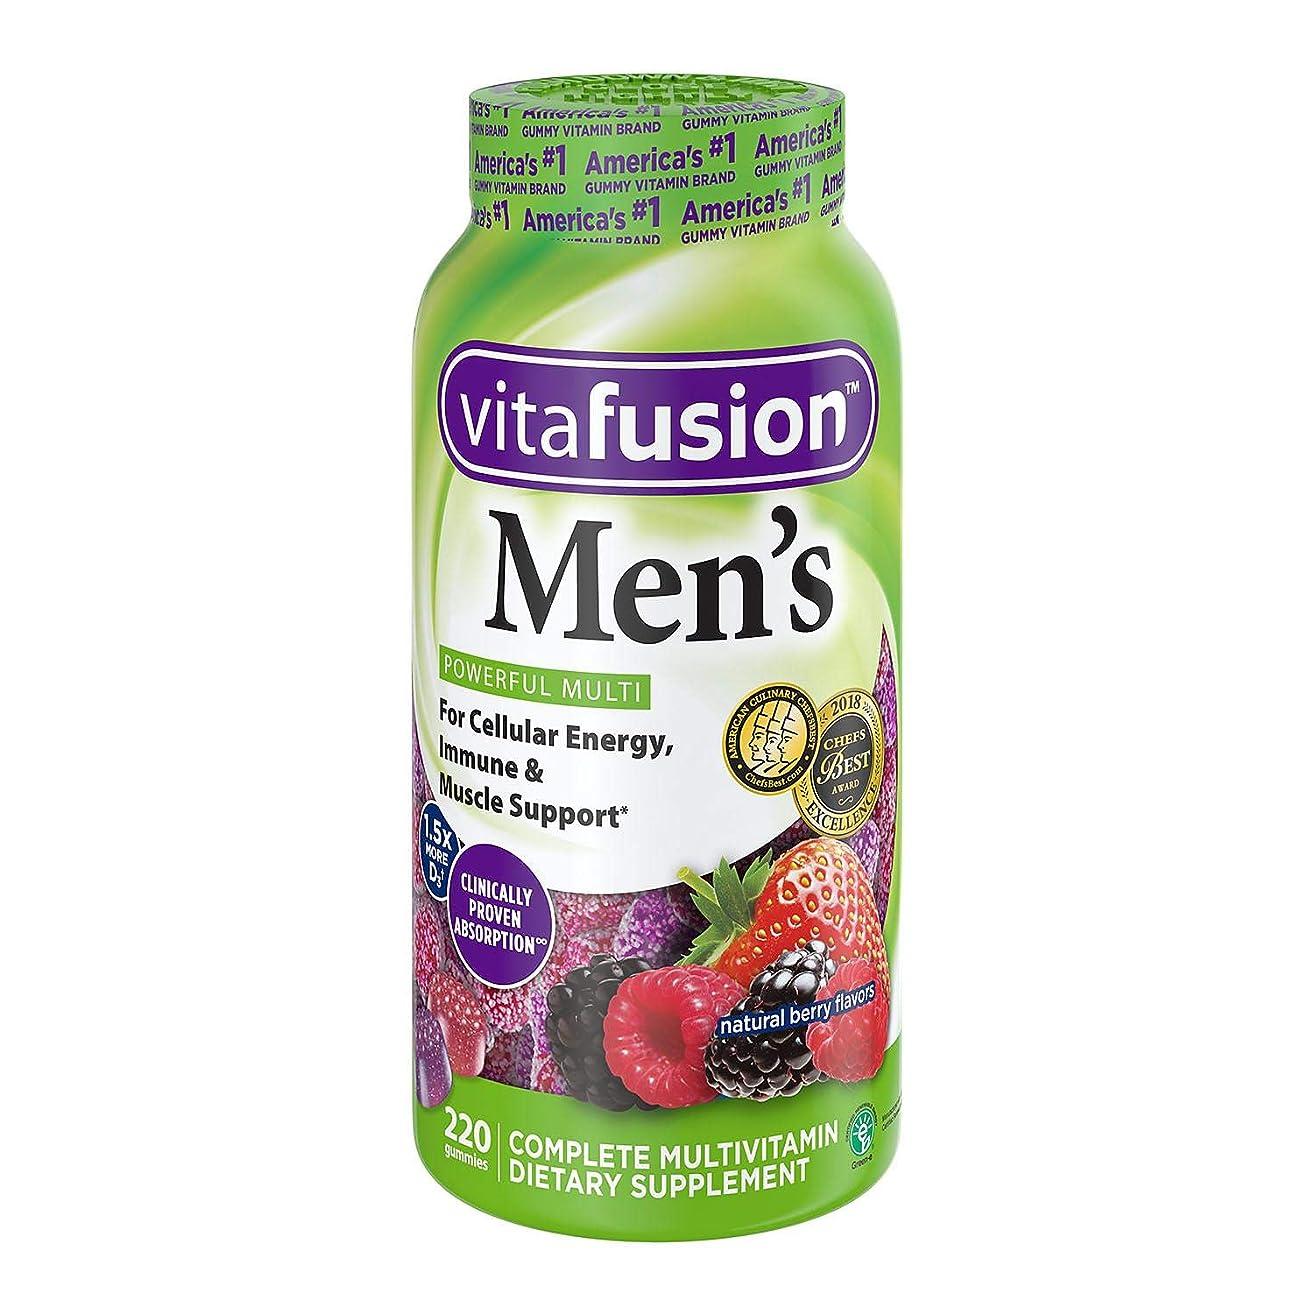 Vitafusion Men's Complete Multivitamin Gummies Natural Berry Flavors - 150 ct, Pack of 2